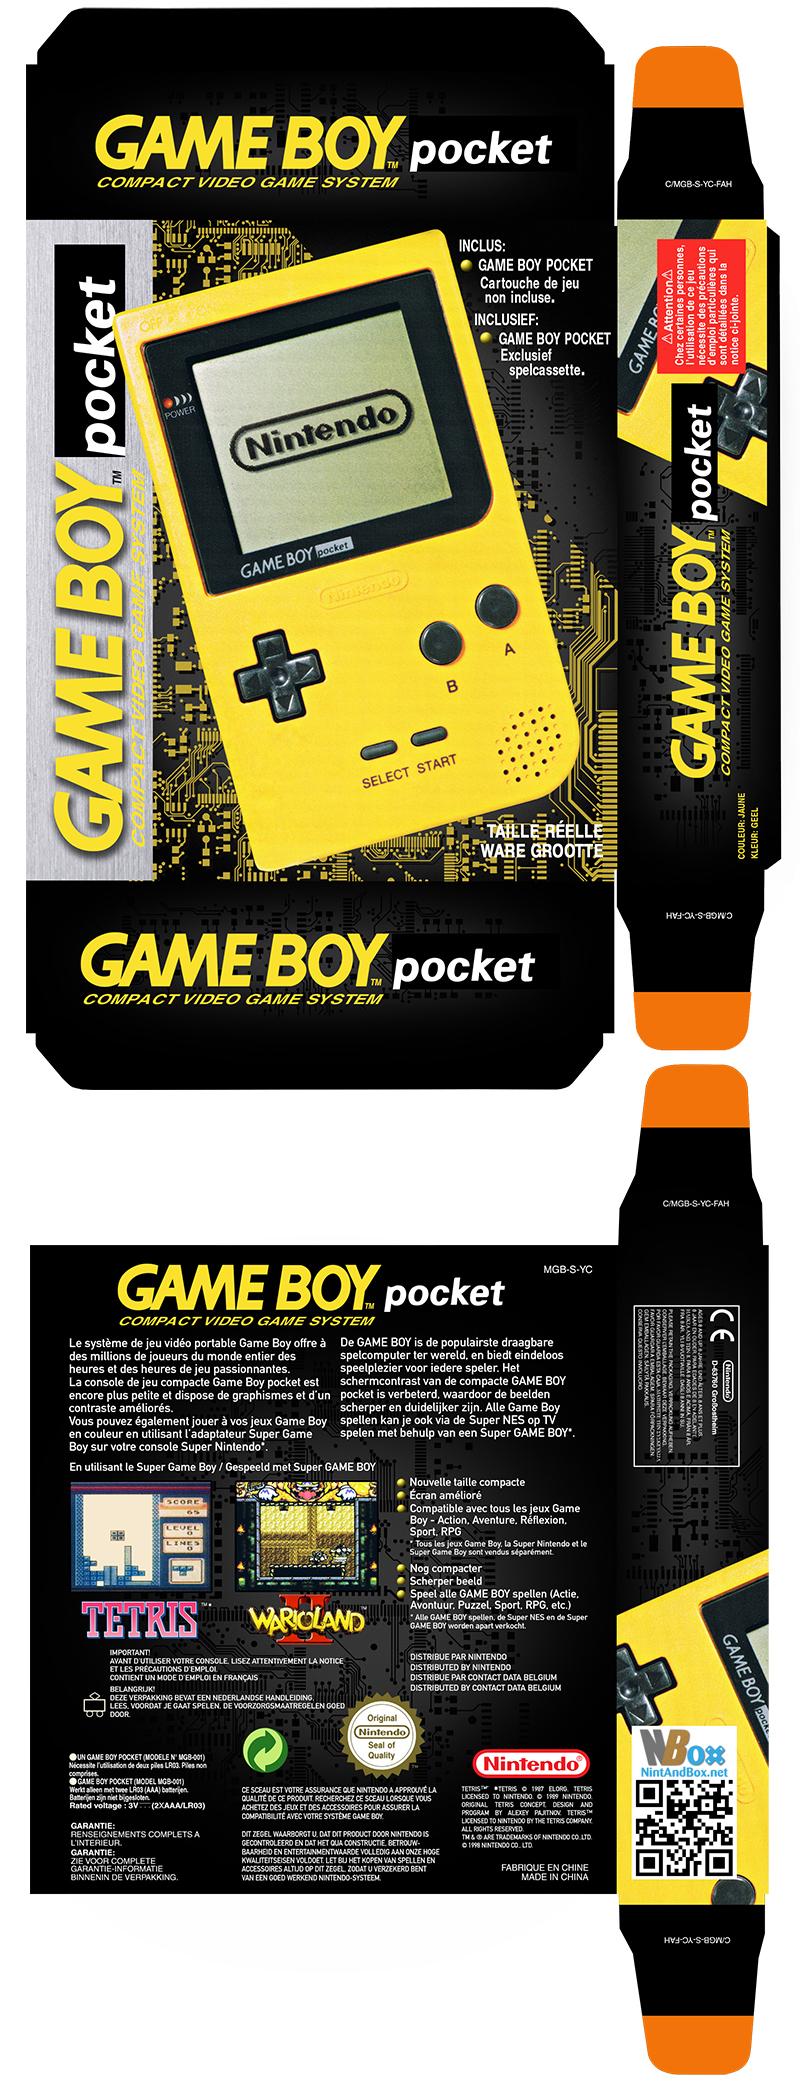 Console_GameBoyPocket_Miniature2.jpg